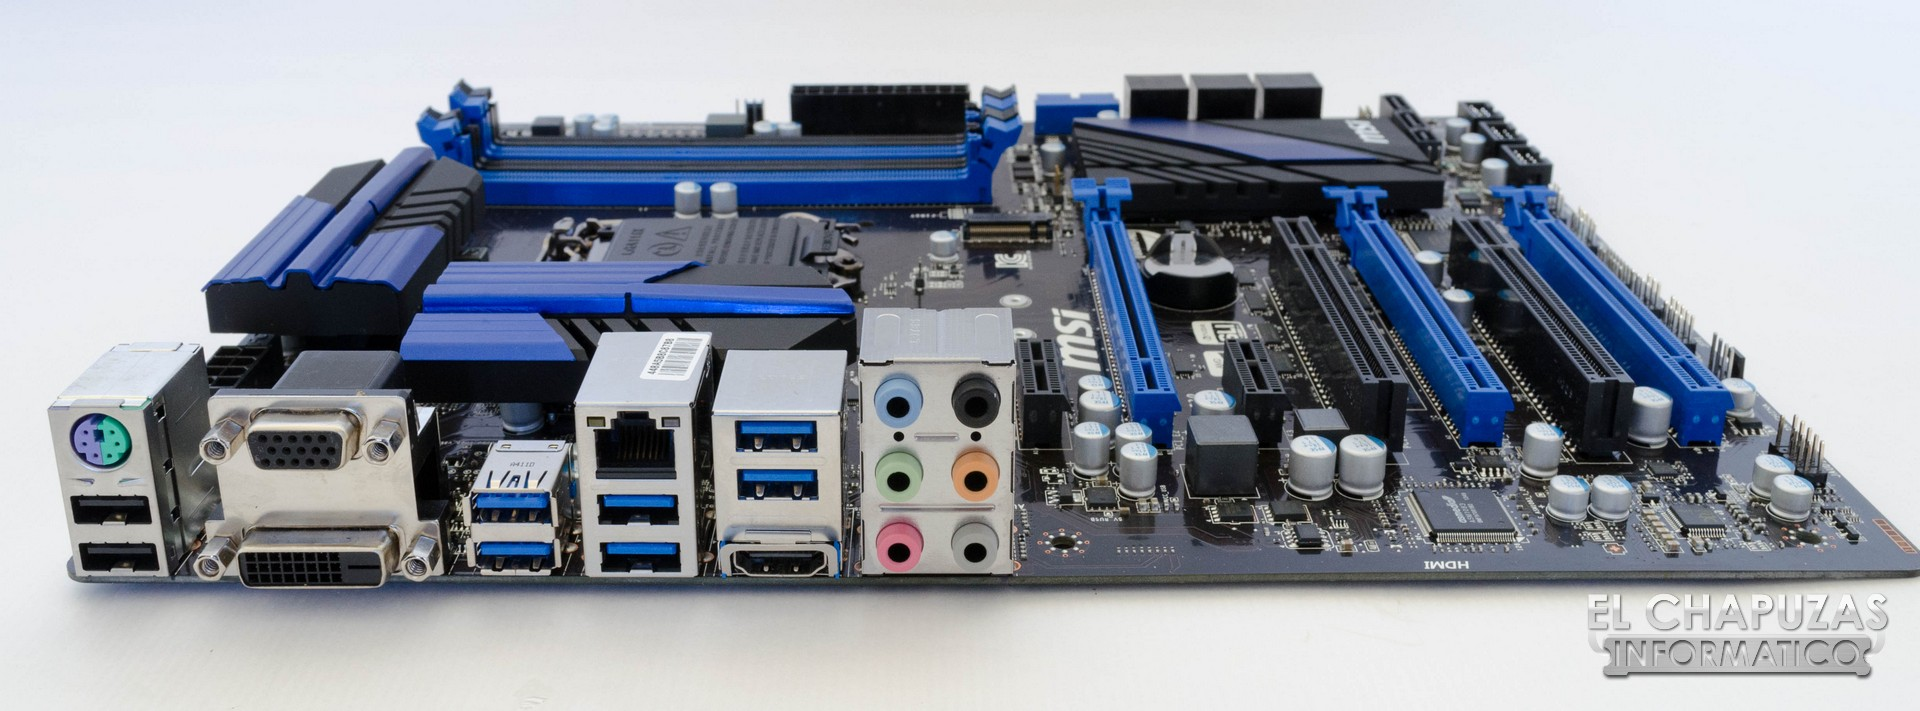 MSI Z97S SLI PLUS ASMedia USB 3.0 Drivers Download